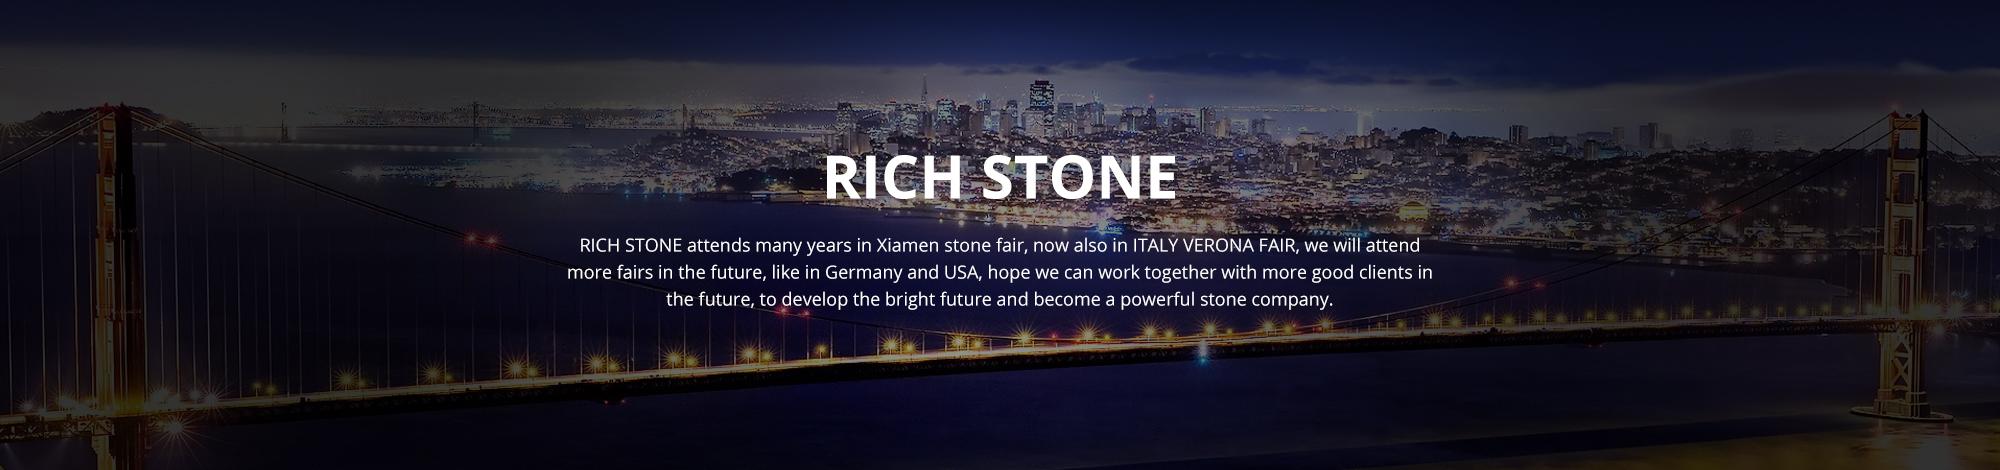 Rich Stone